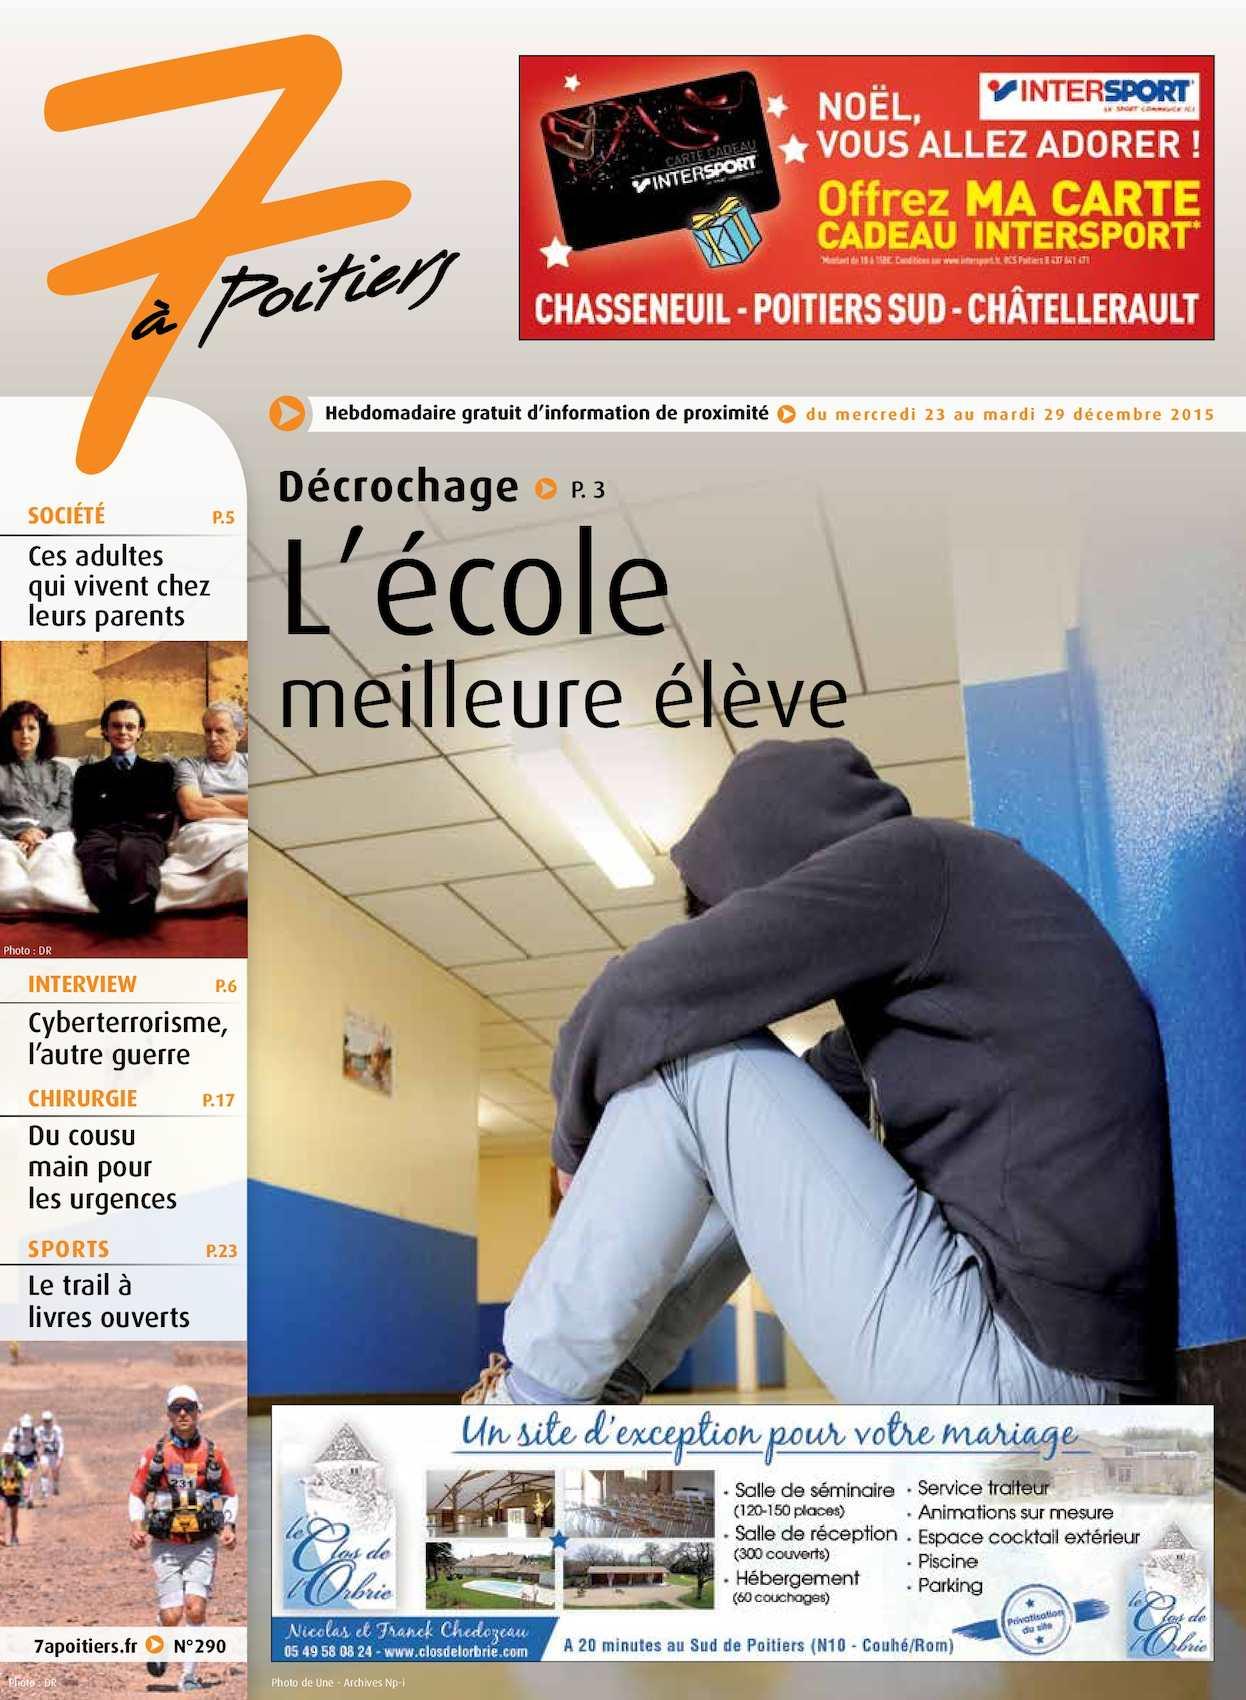 Calaméo - 7 à Poitiers - 290 fb5b28f9ed1